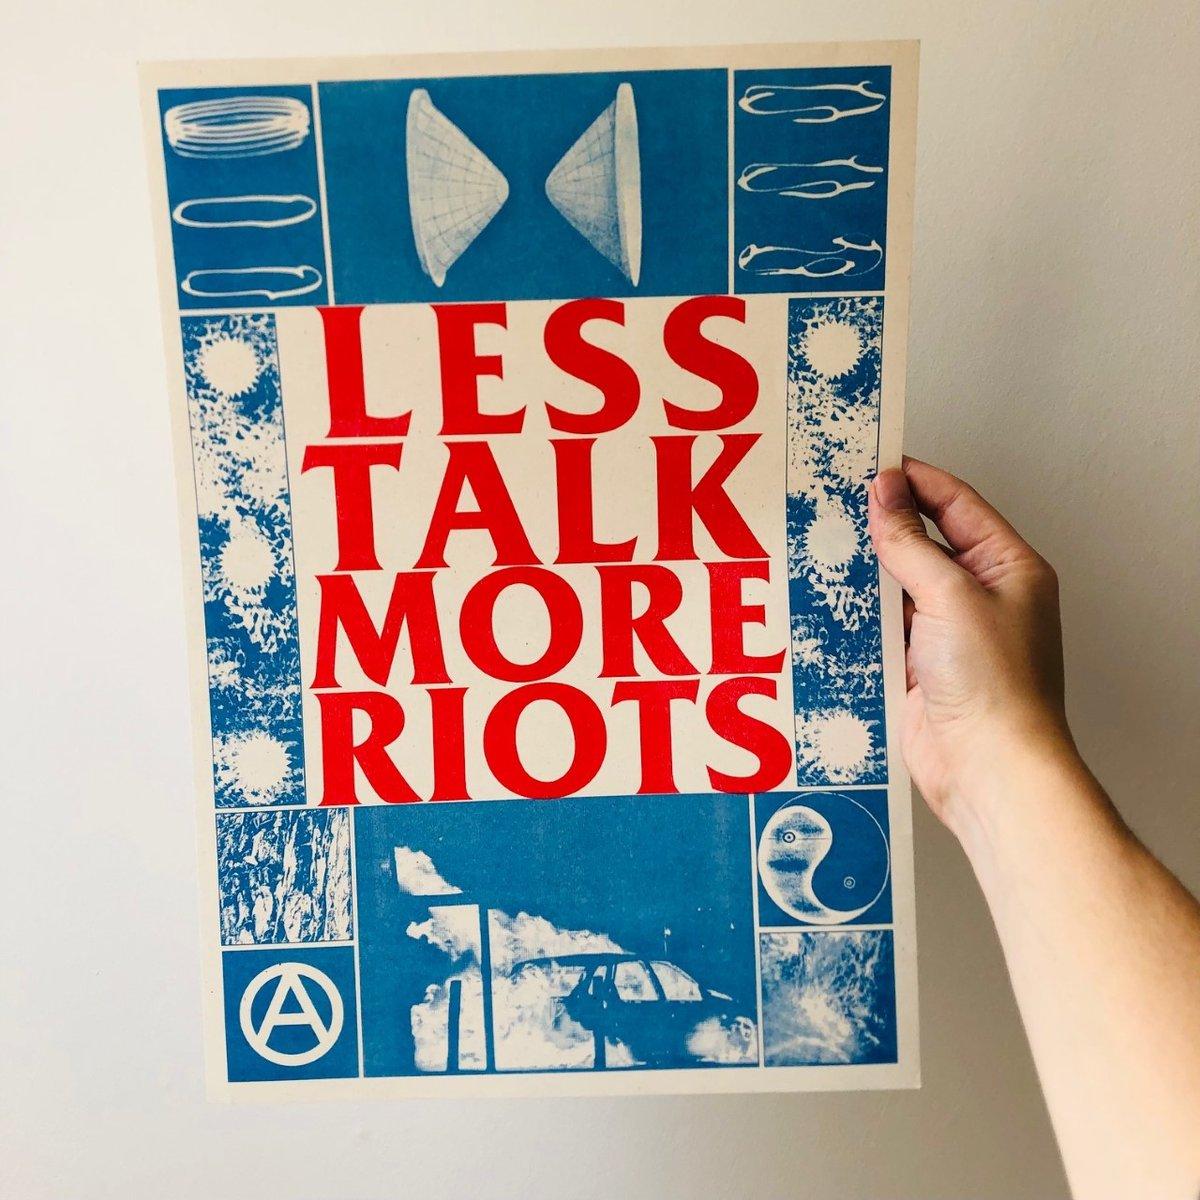 Image of LESS TALK MORE RIOTS A3 riso print